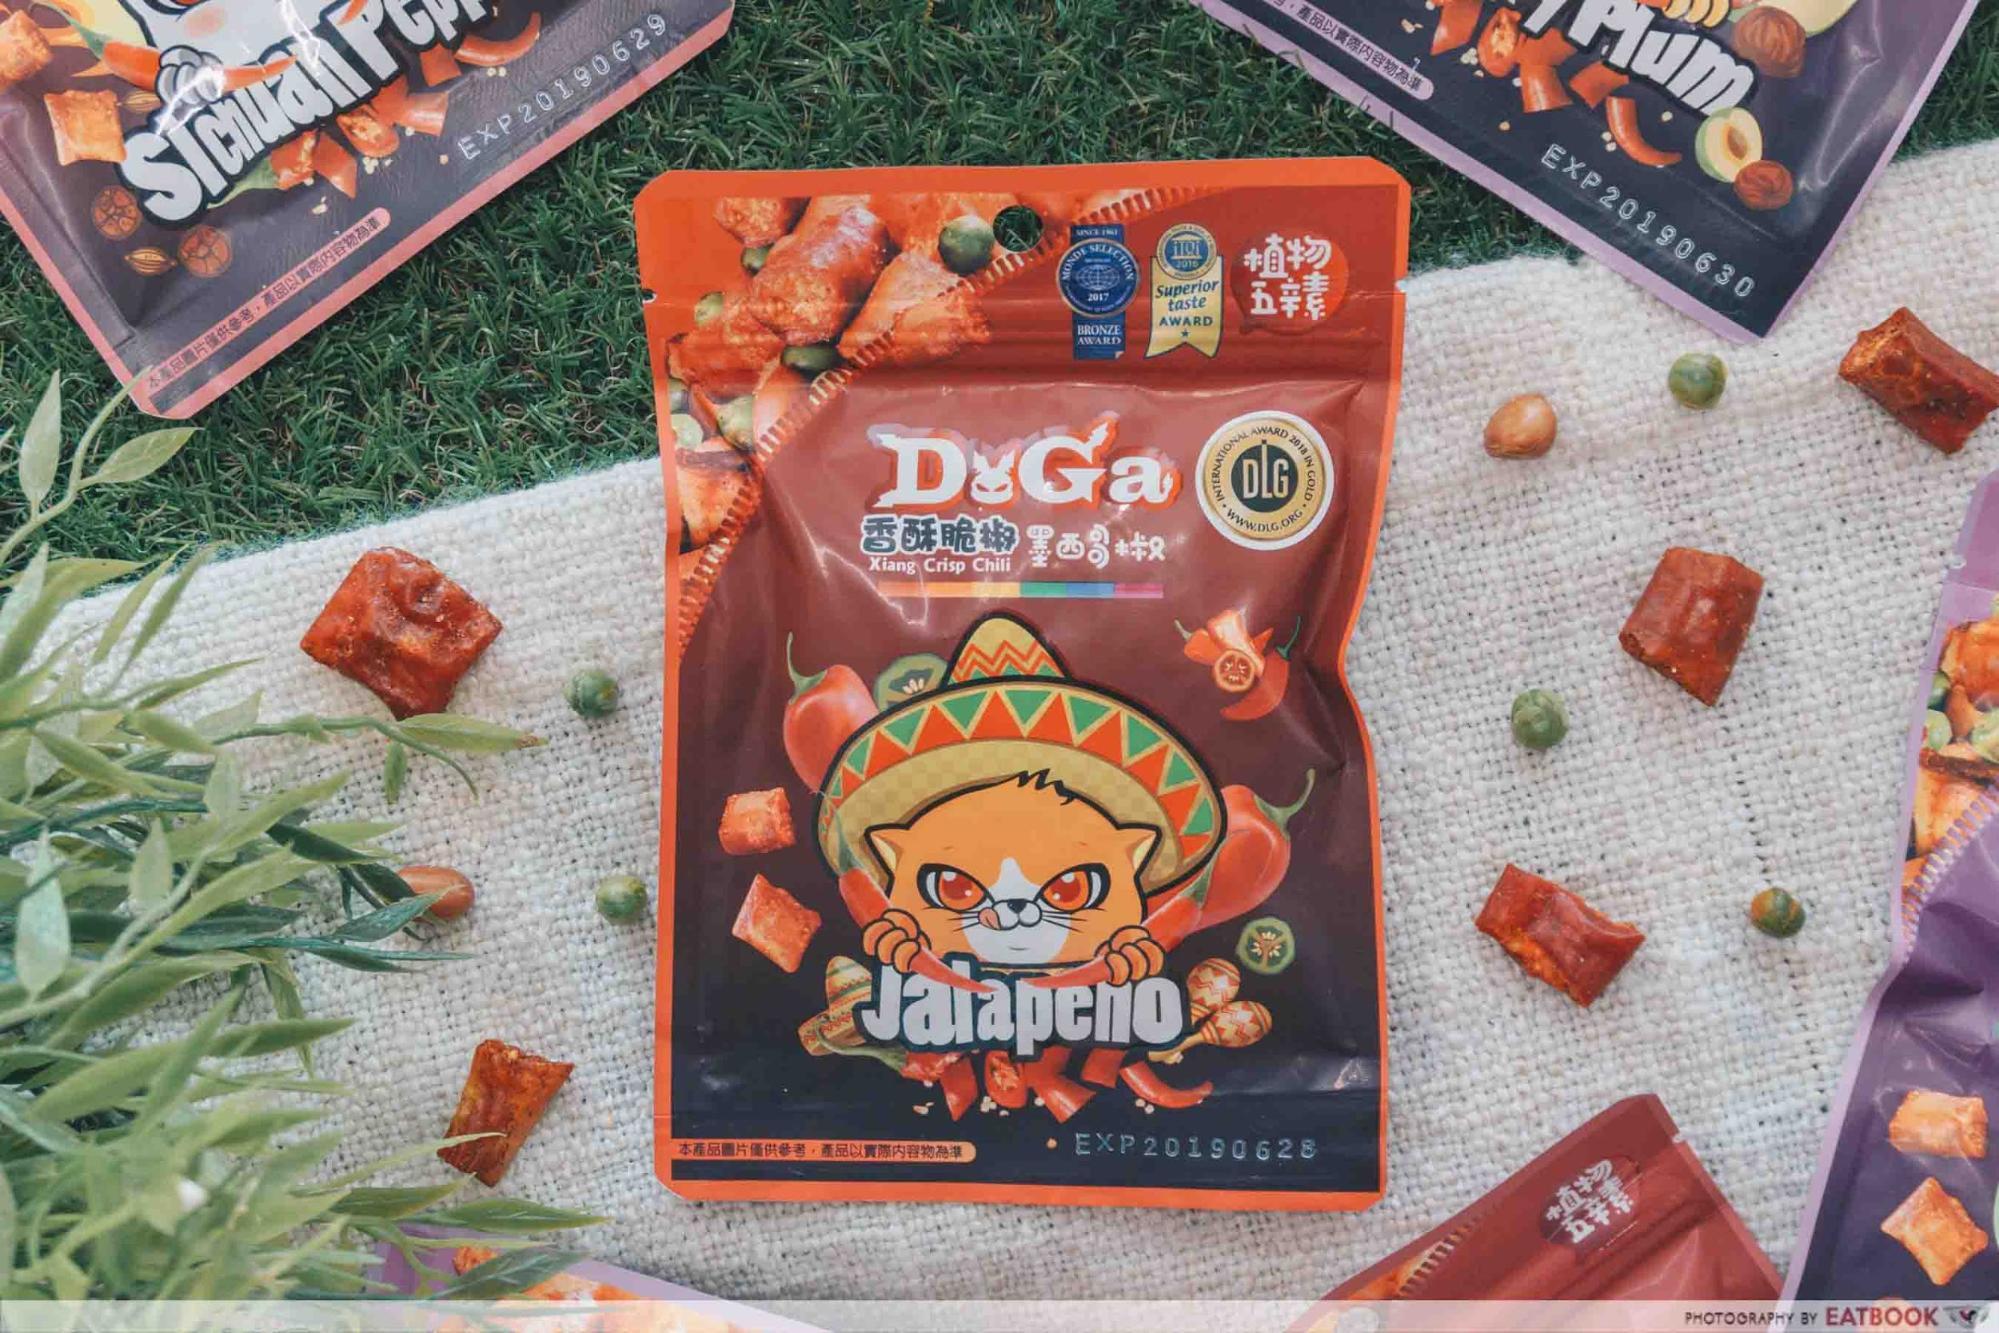 Doga Xiang Crisp Chili - Jalapeno